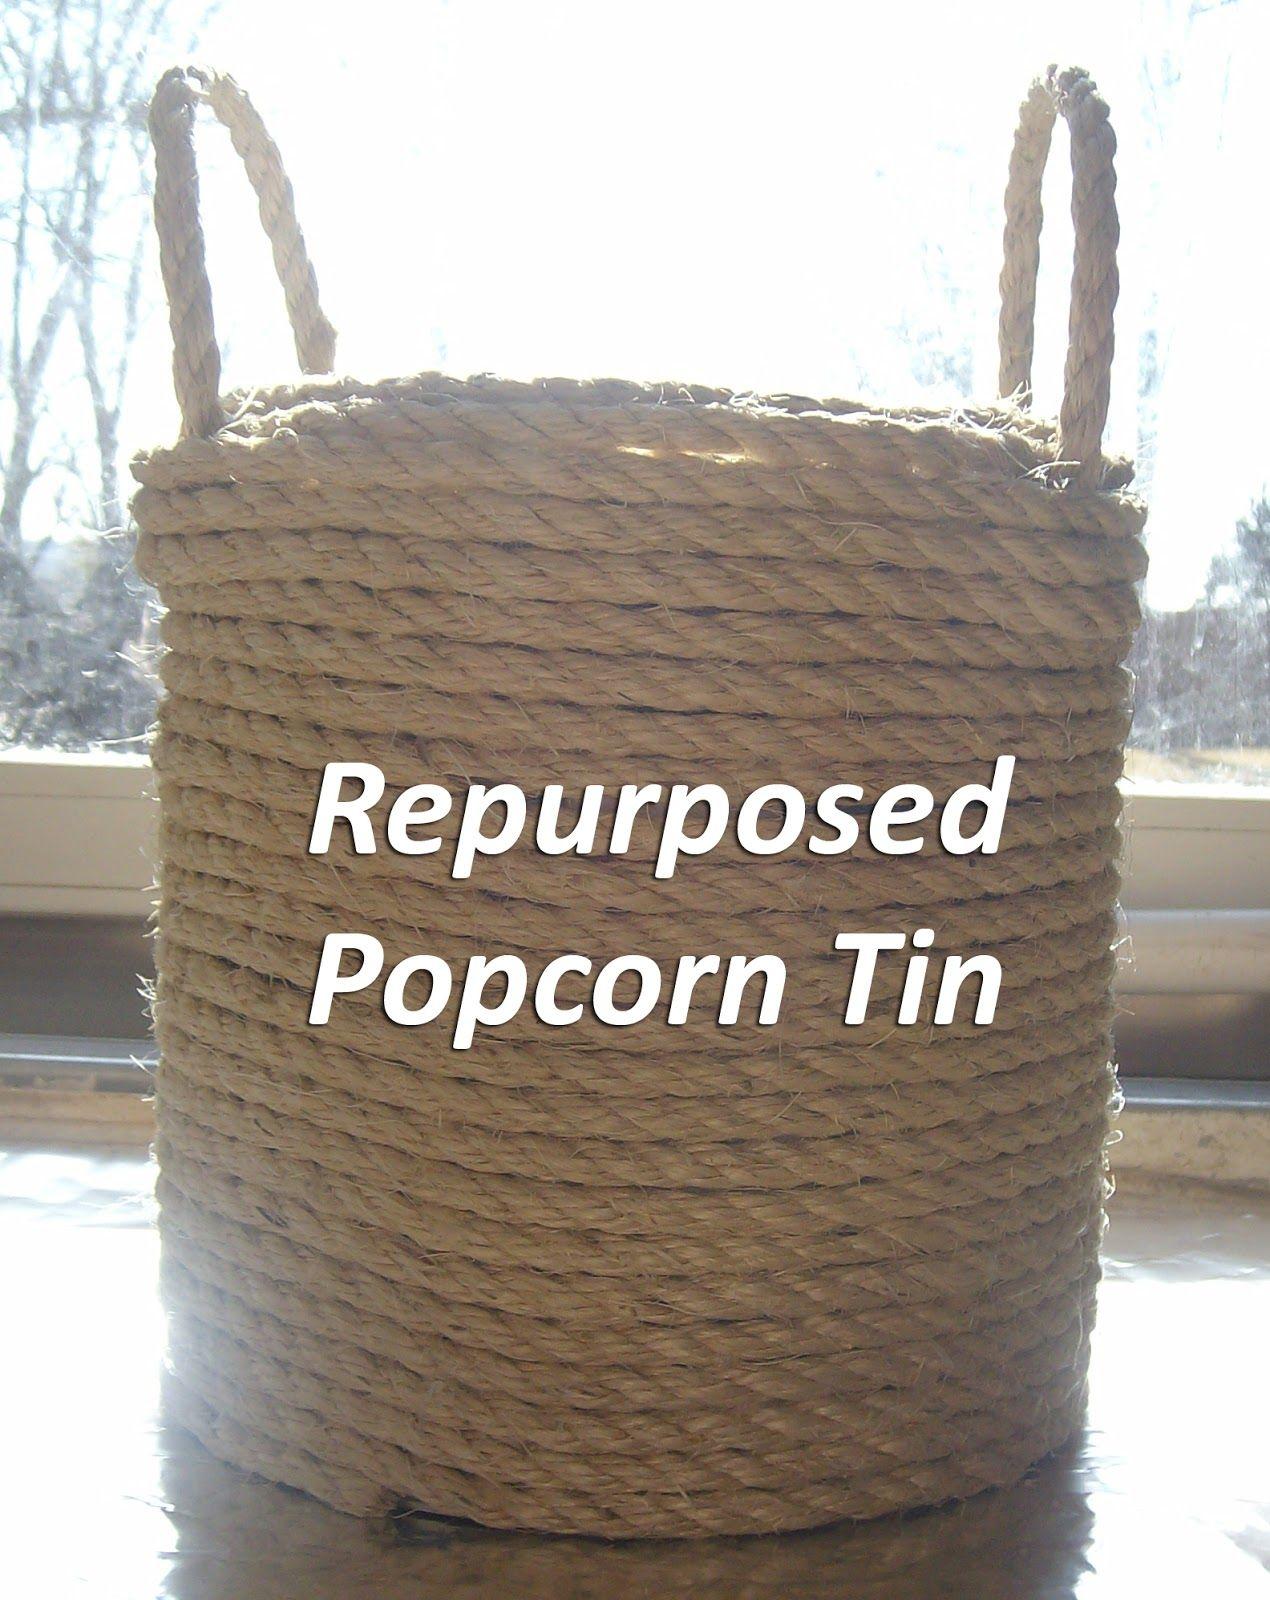 Diy Repurposed Popcorn Tins Popcorn Tin Hot Glue And Twine Or